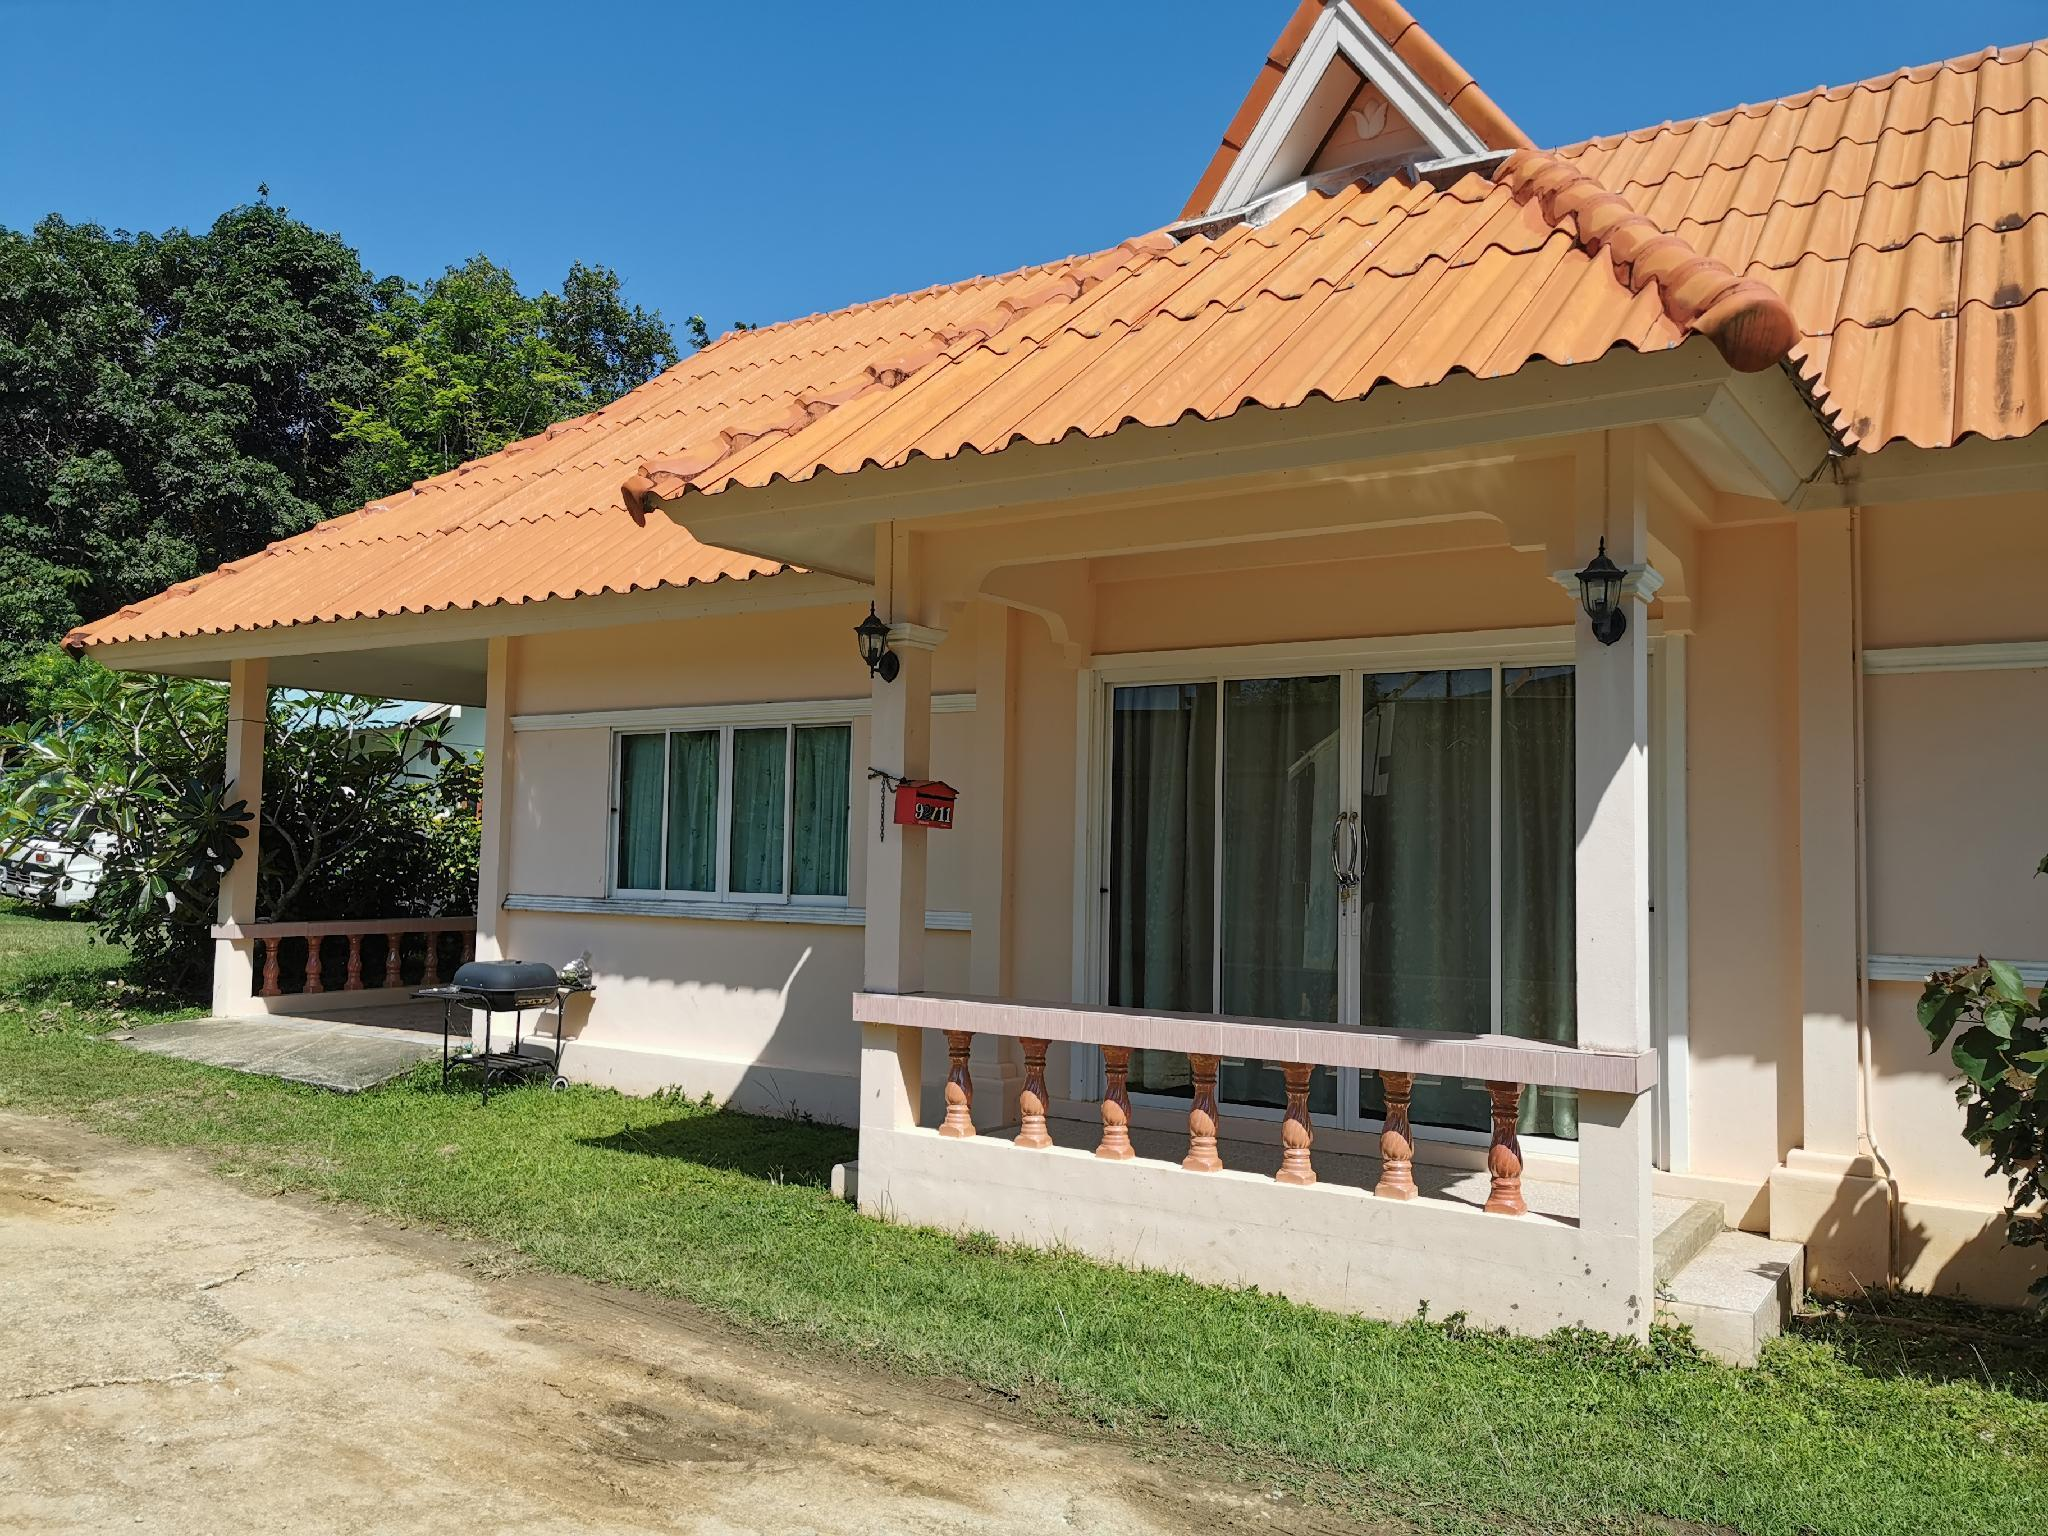 House in the village บ้านเดี่ยว 3 ห้องนอน 2 ห้องน้ำส่วนตัว ขนาด 90 ตร.ม. – ในหาน